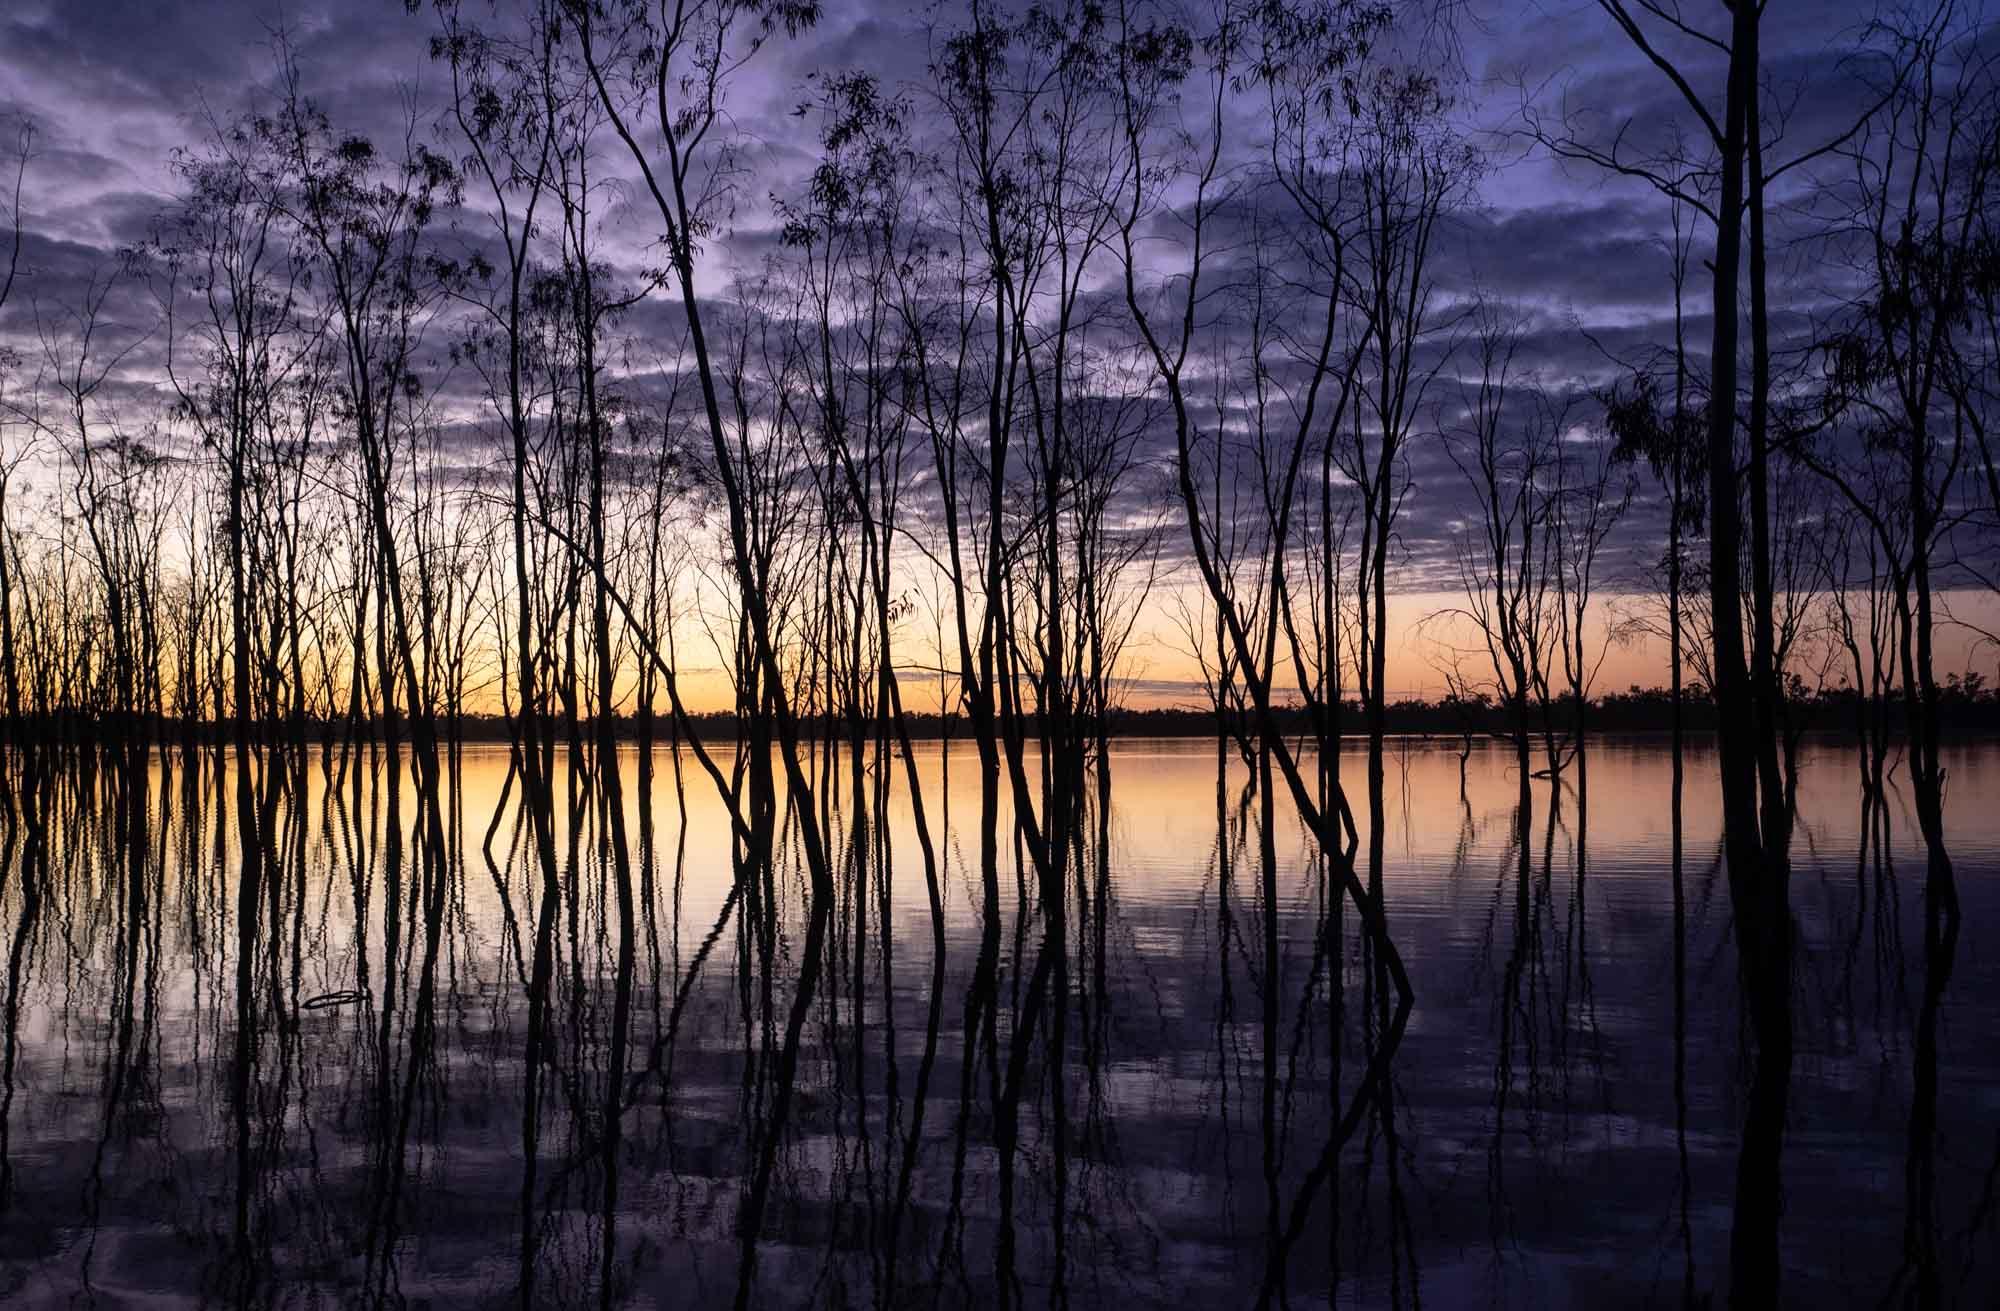 Lake Mournpall at dawn